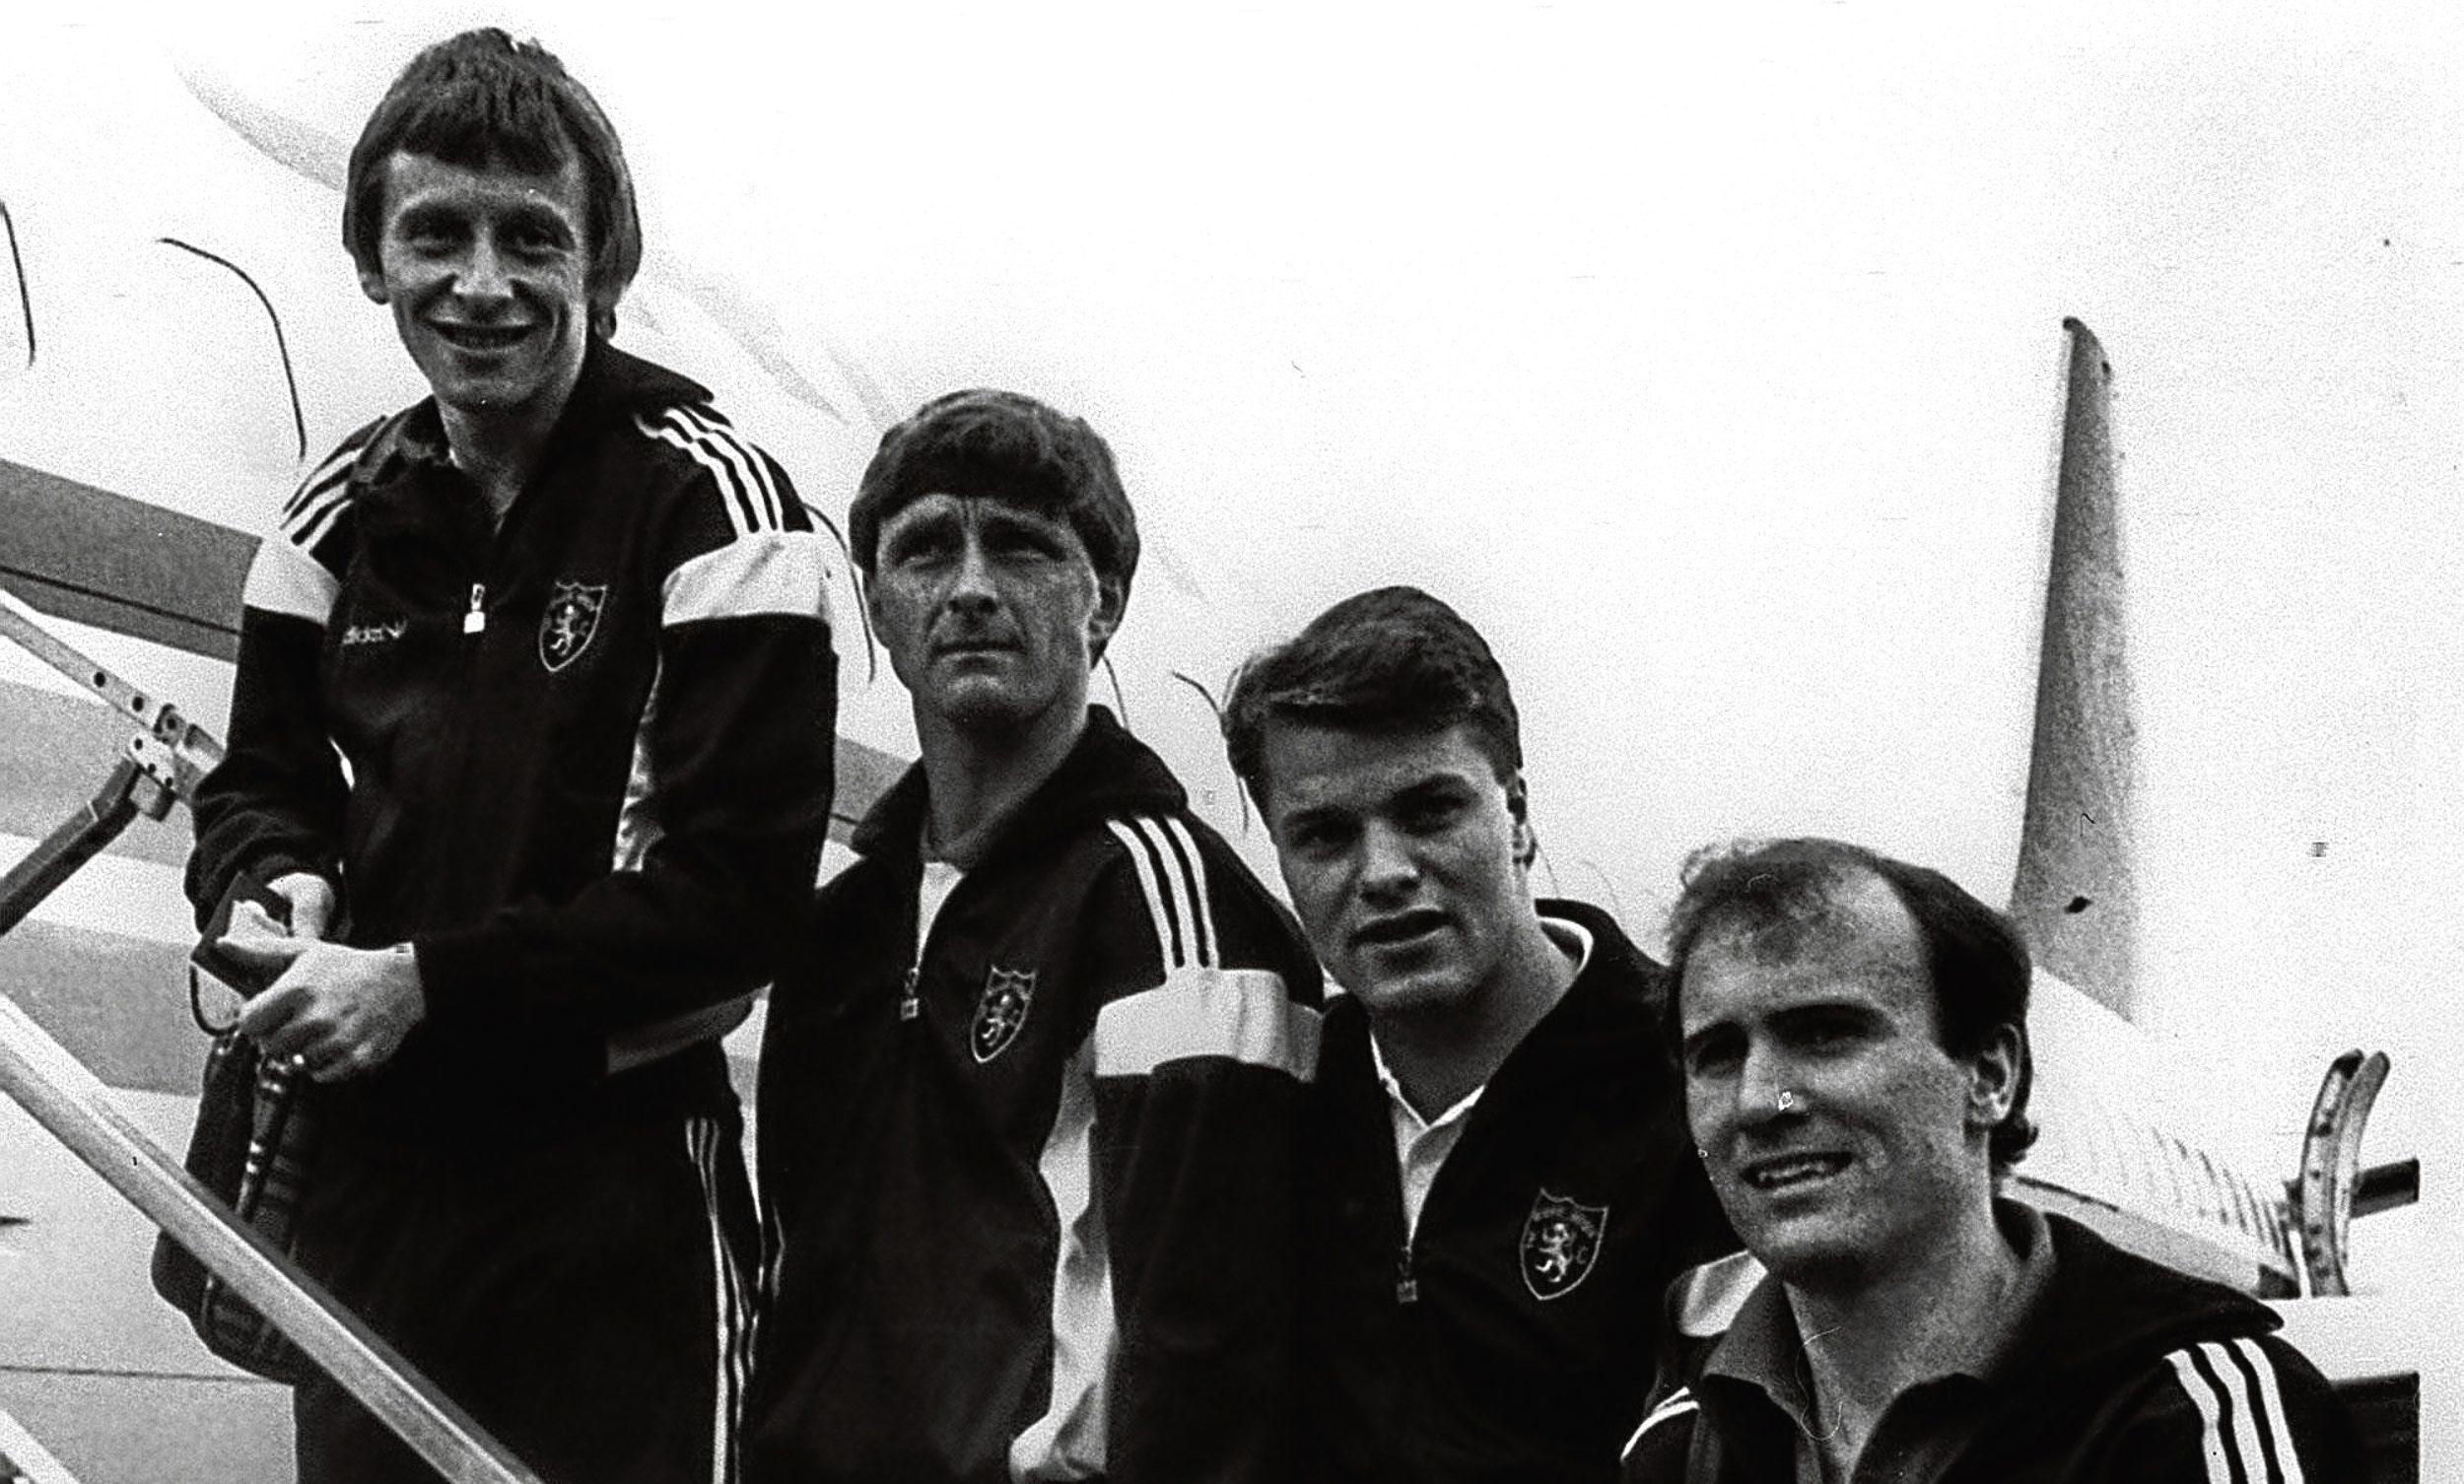 Dundee United FC players Paul Sturrock, Paul Hegarty, John Clark and Eamonn Bannon board the flight to Barcelona, 1987.